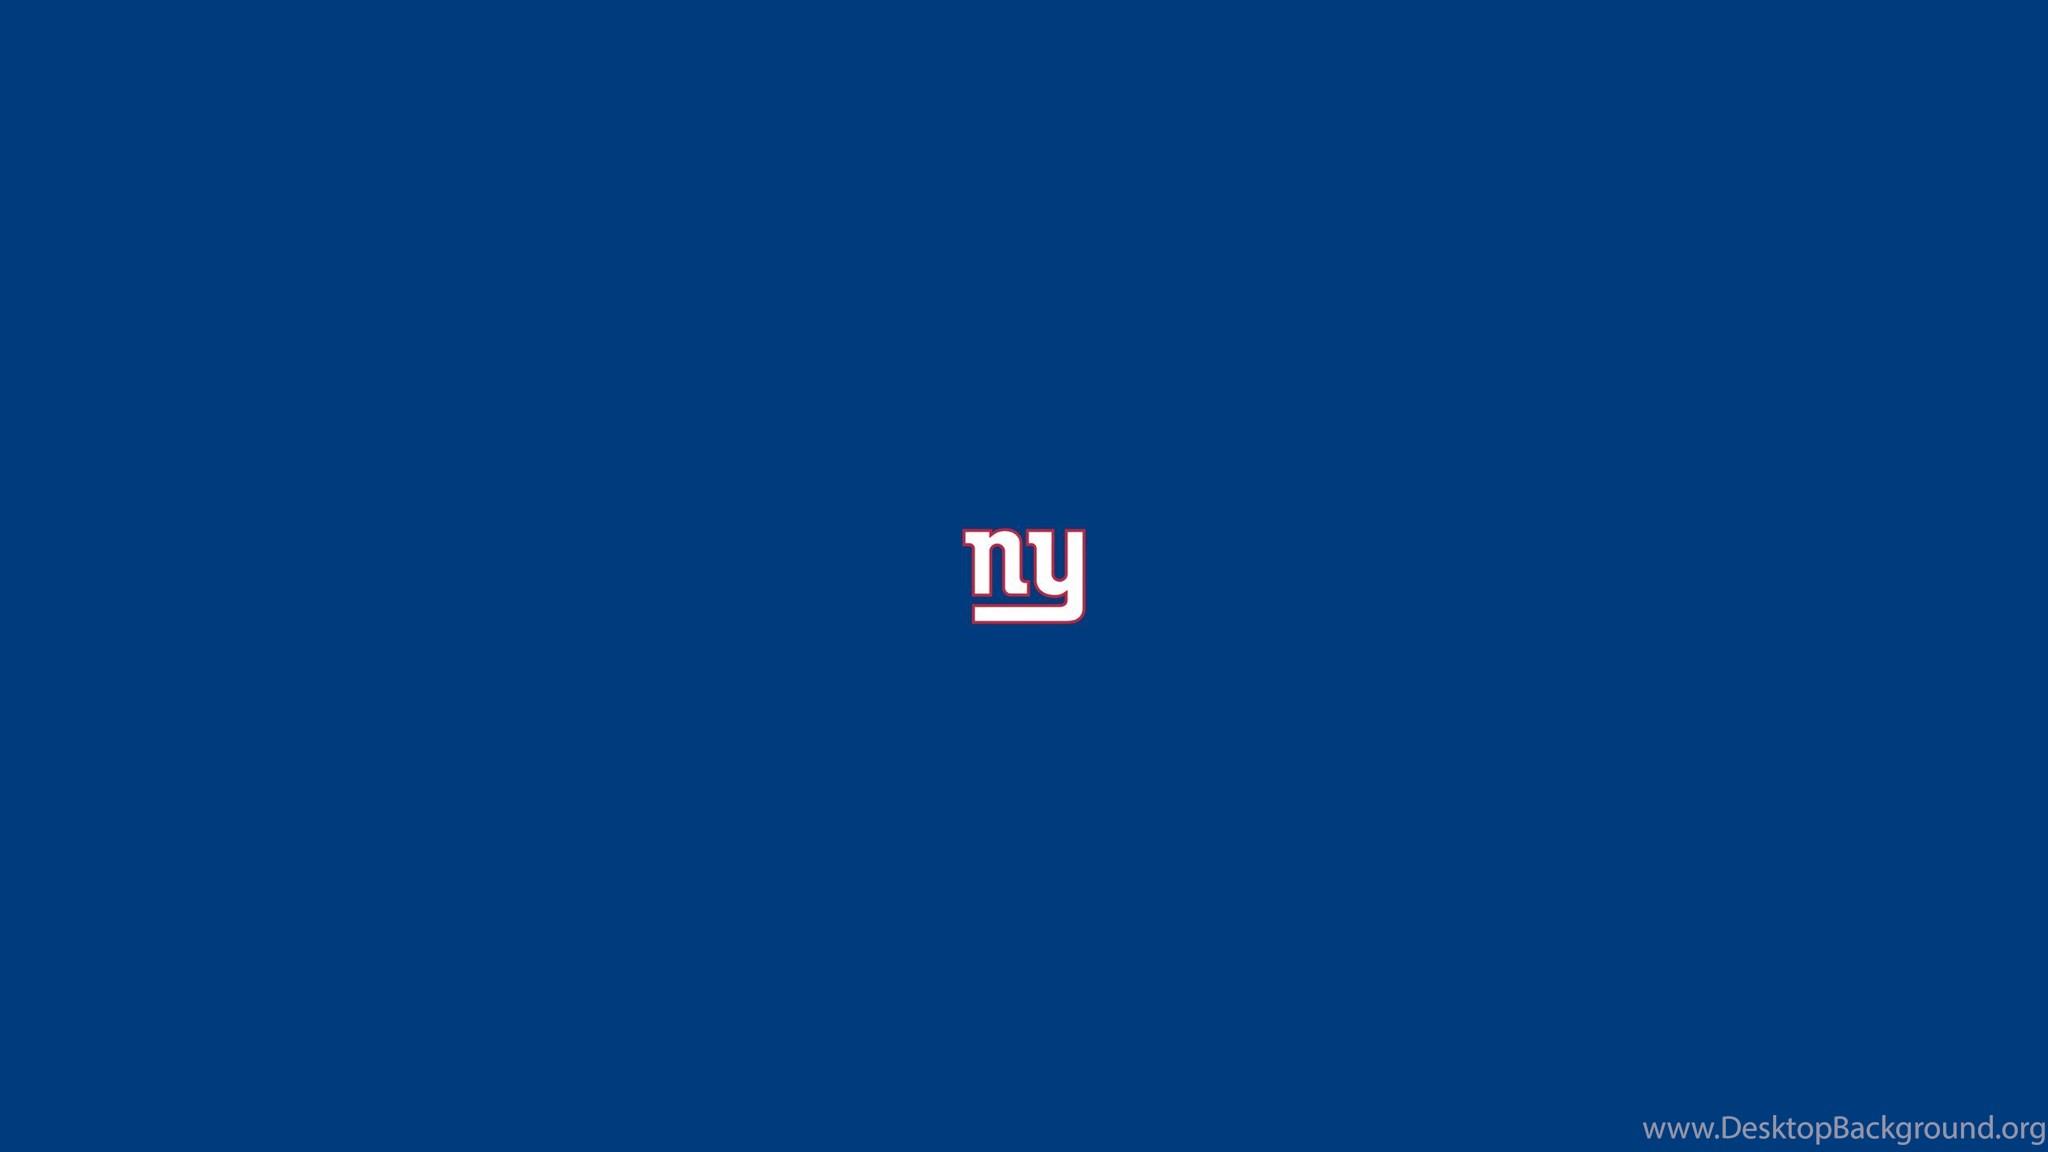 New York Giants Nfl Football E Wallpapers Desktop Background